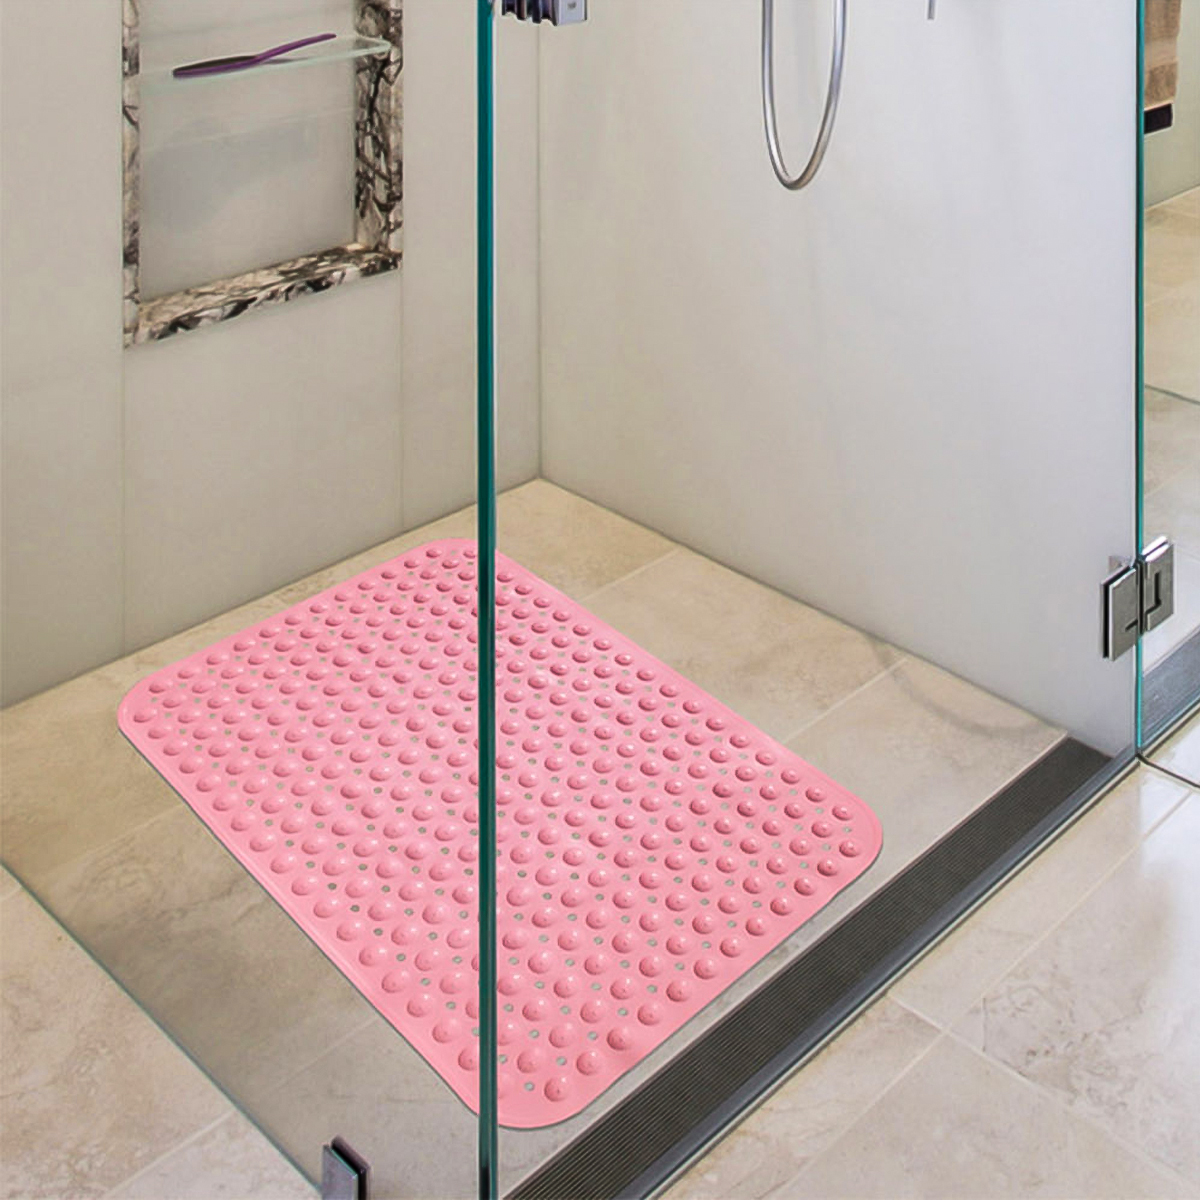 2019 Large Strong Suction Bathroom Mat Anti Slip Bath Shower Mat PVC Massage Particles Foot Pad